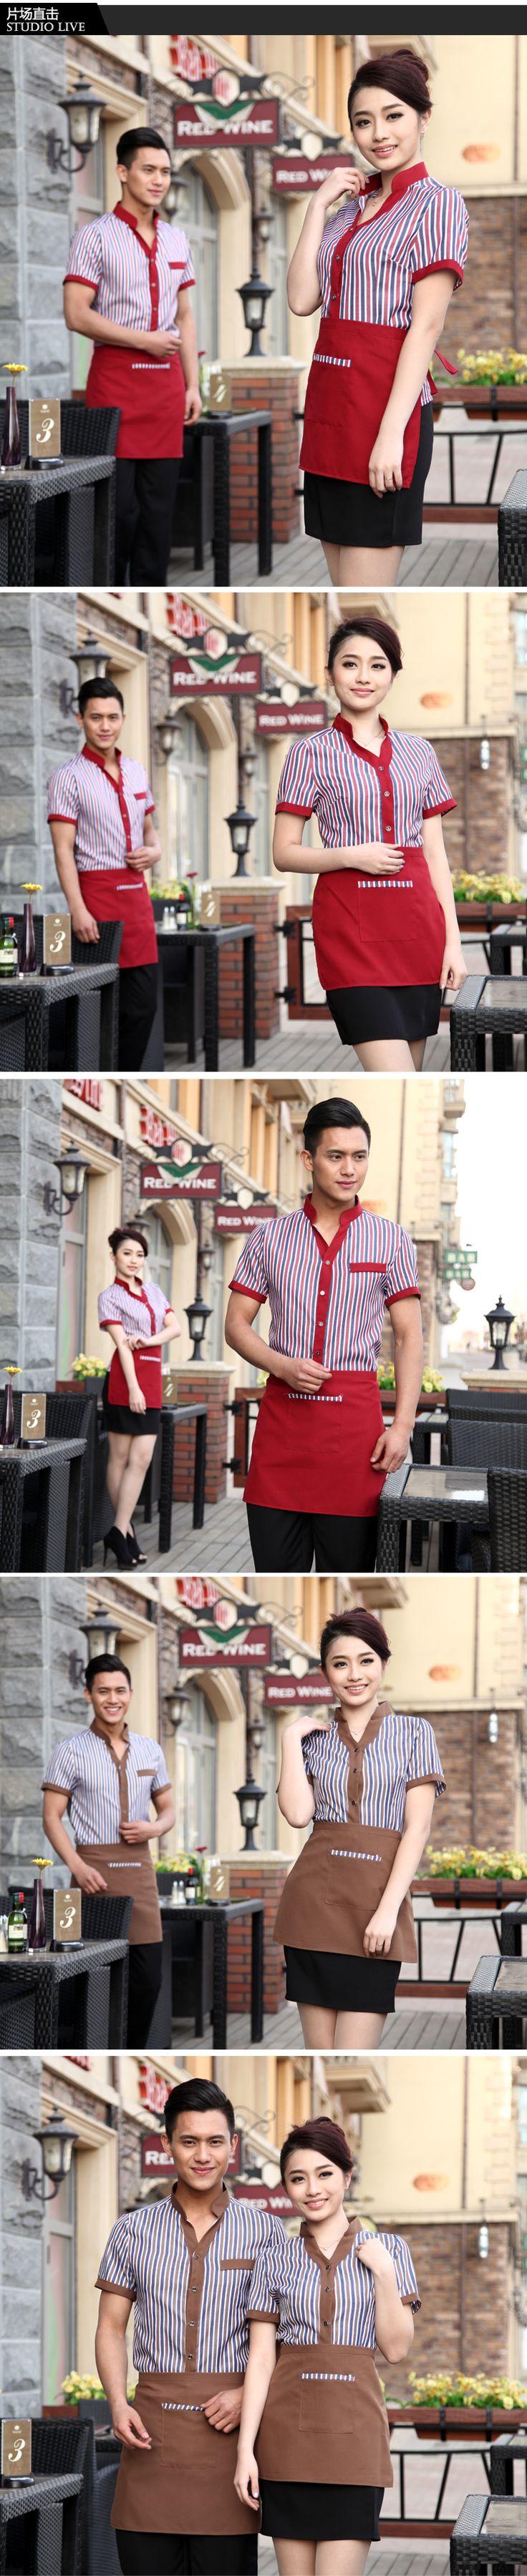 27 best clothes for restaurants images on pinterest | restaurant